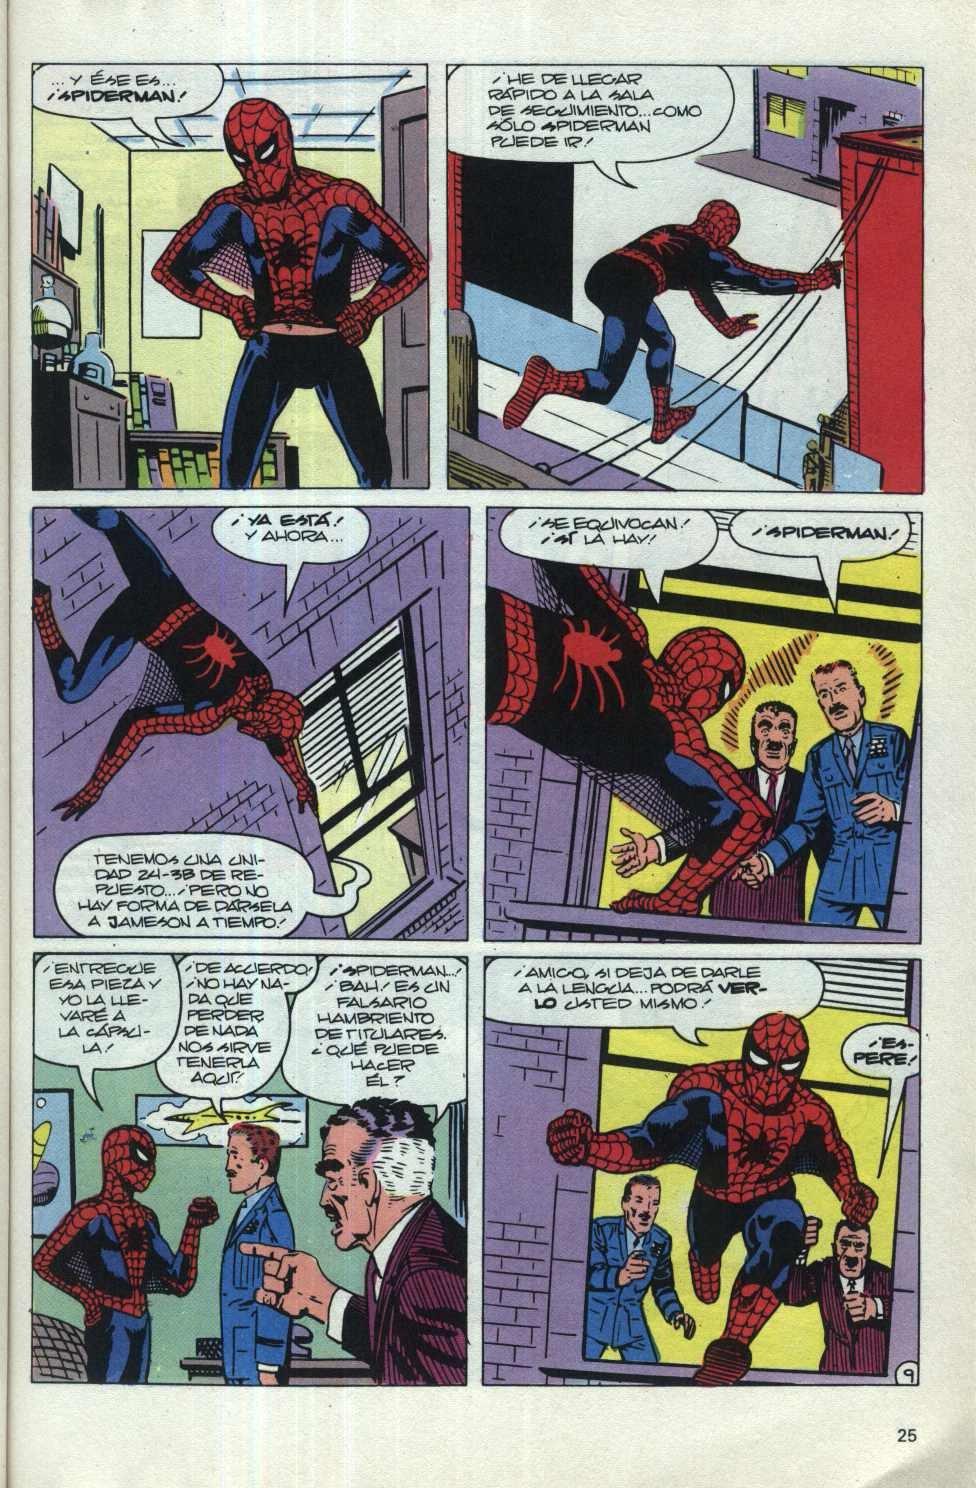 The Amazing Spider-Man 2 2014 - blu-ray.com